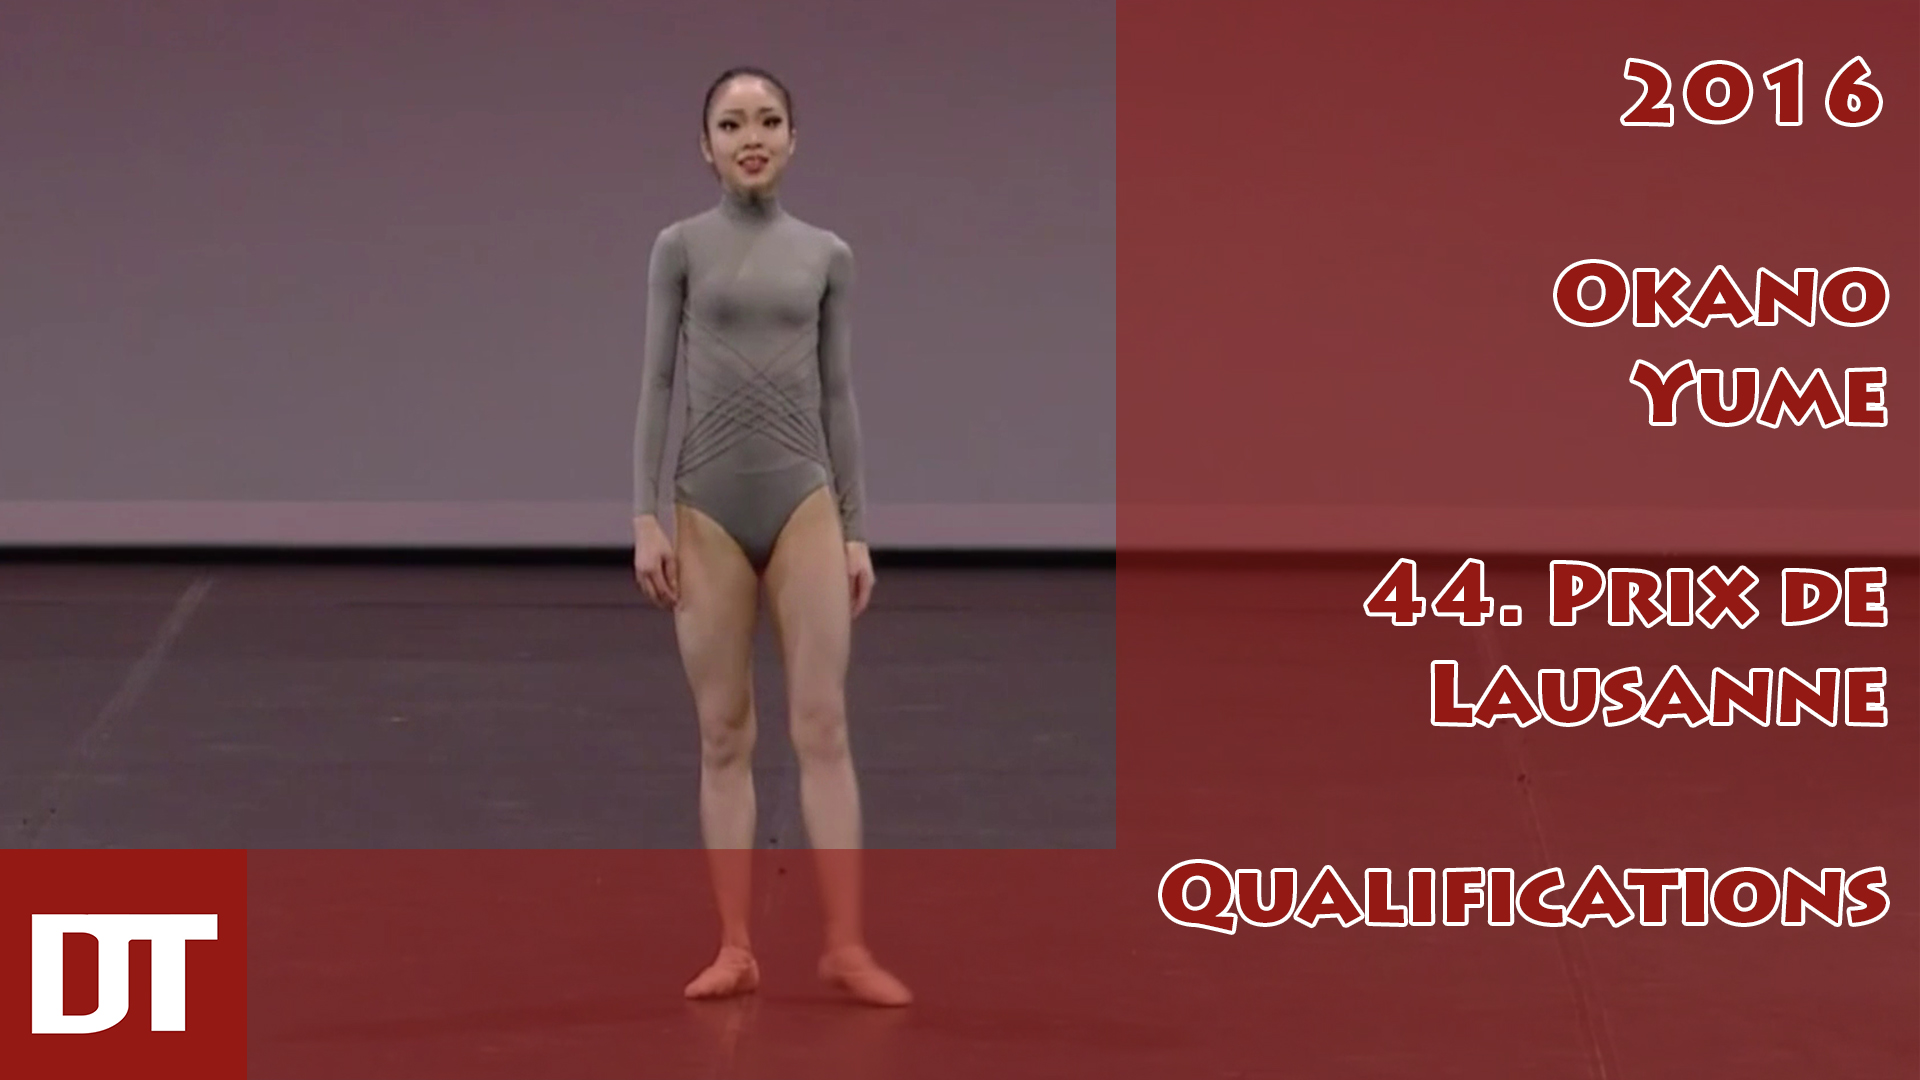 2016 – Okano Yume – 44. Prix de Lausanne – Qualifications